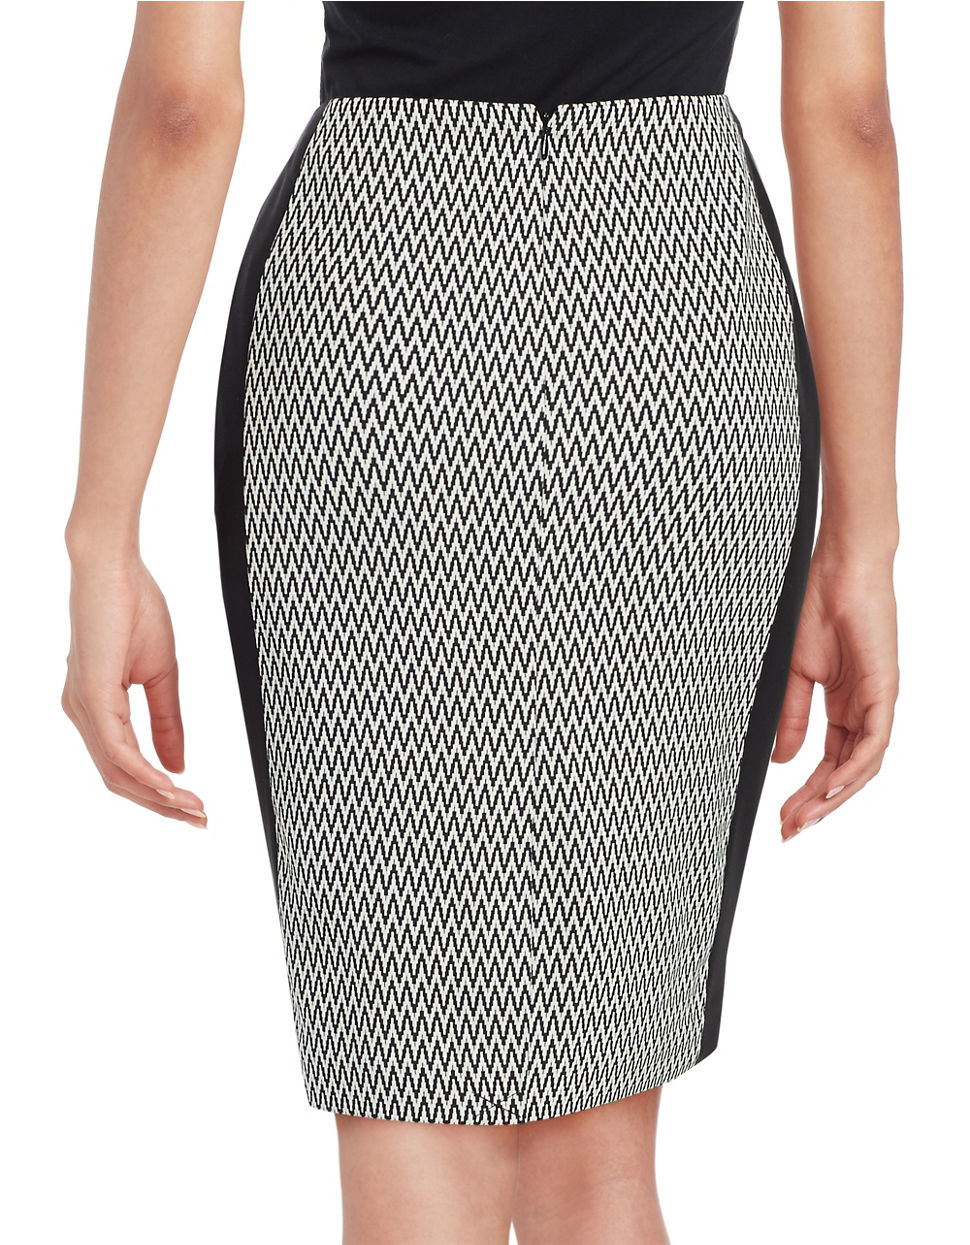 calvin klein patterned pencil skirt in black black